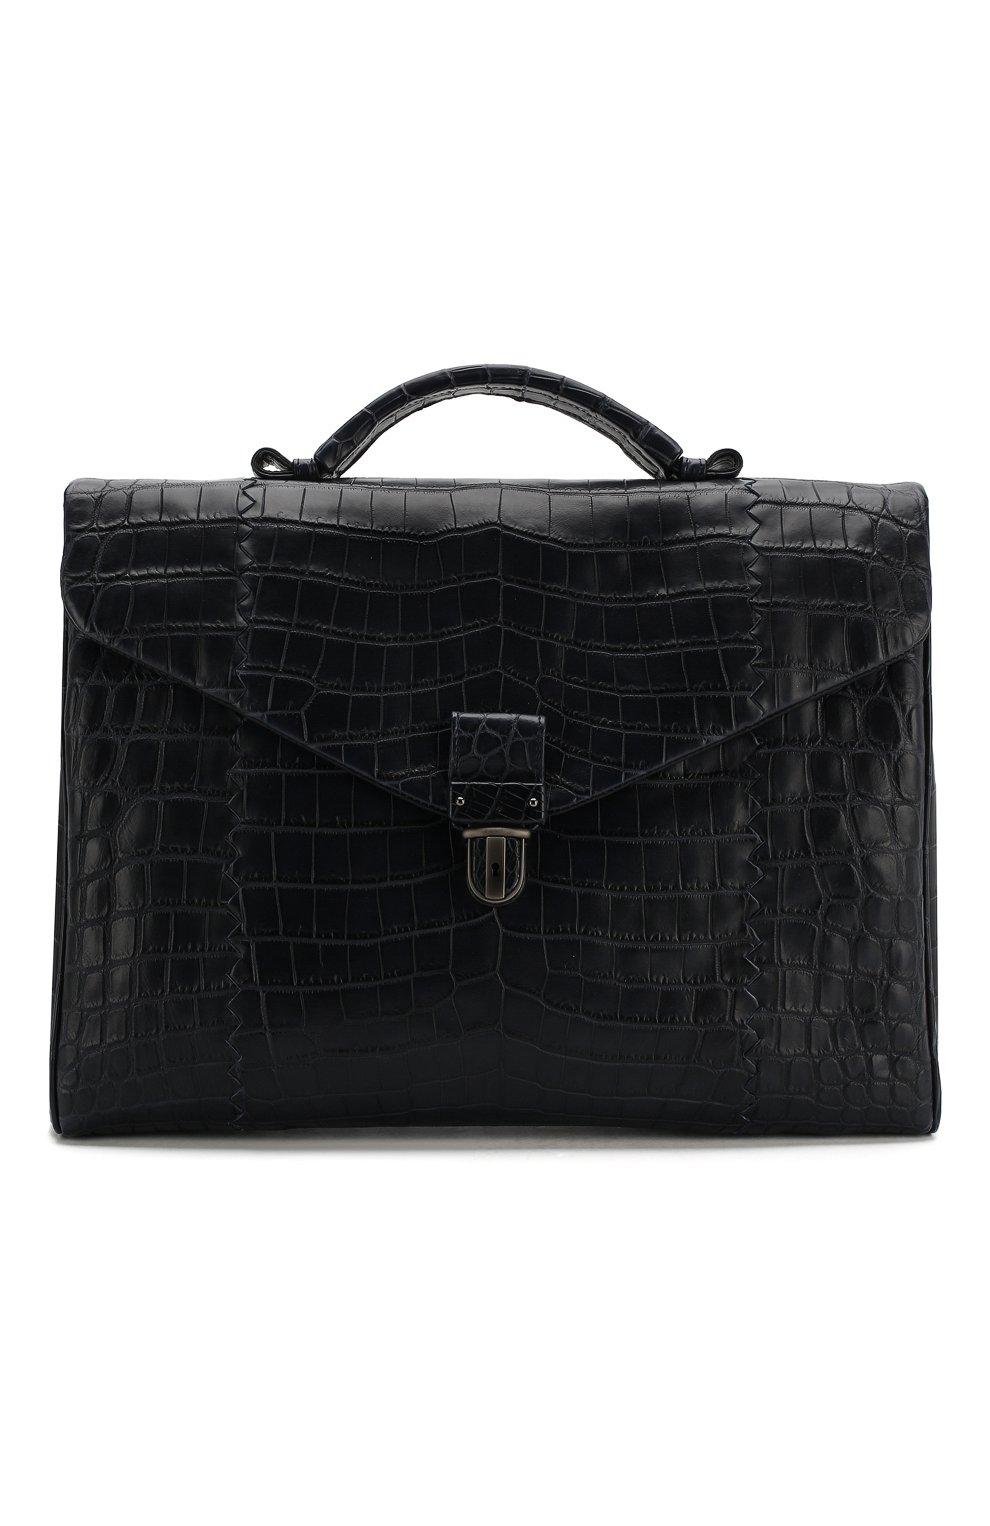 357bf67a7e81 Мужские сумки Dirk Bikkembergs купить в интернет-магазине ЦУМ - товар  распродан